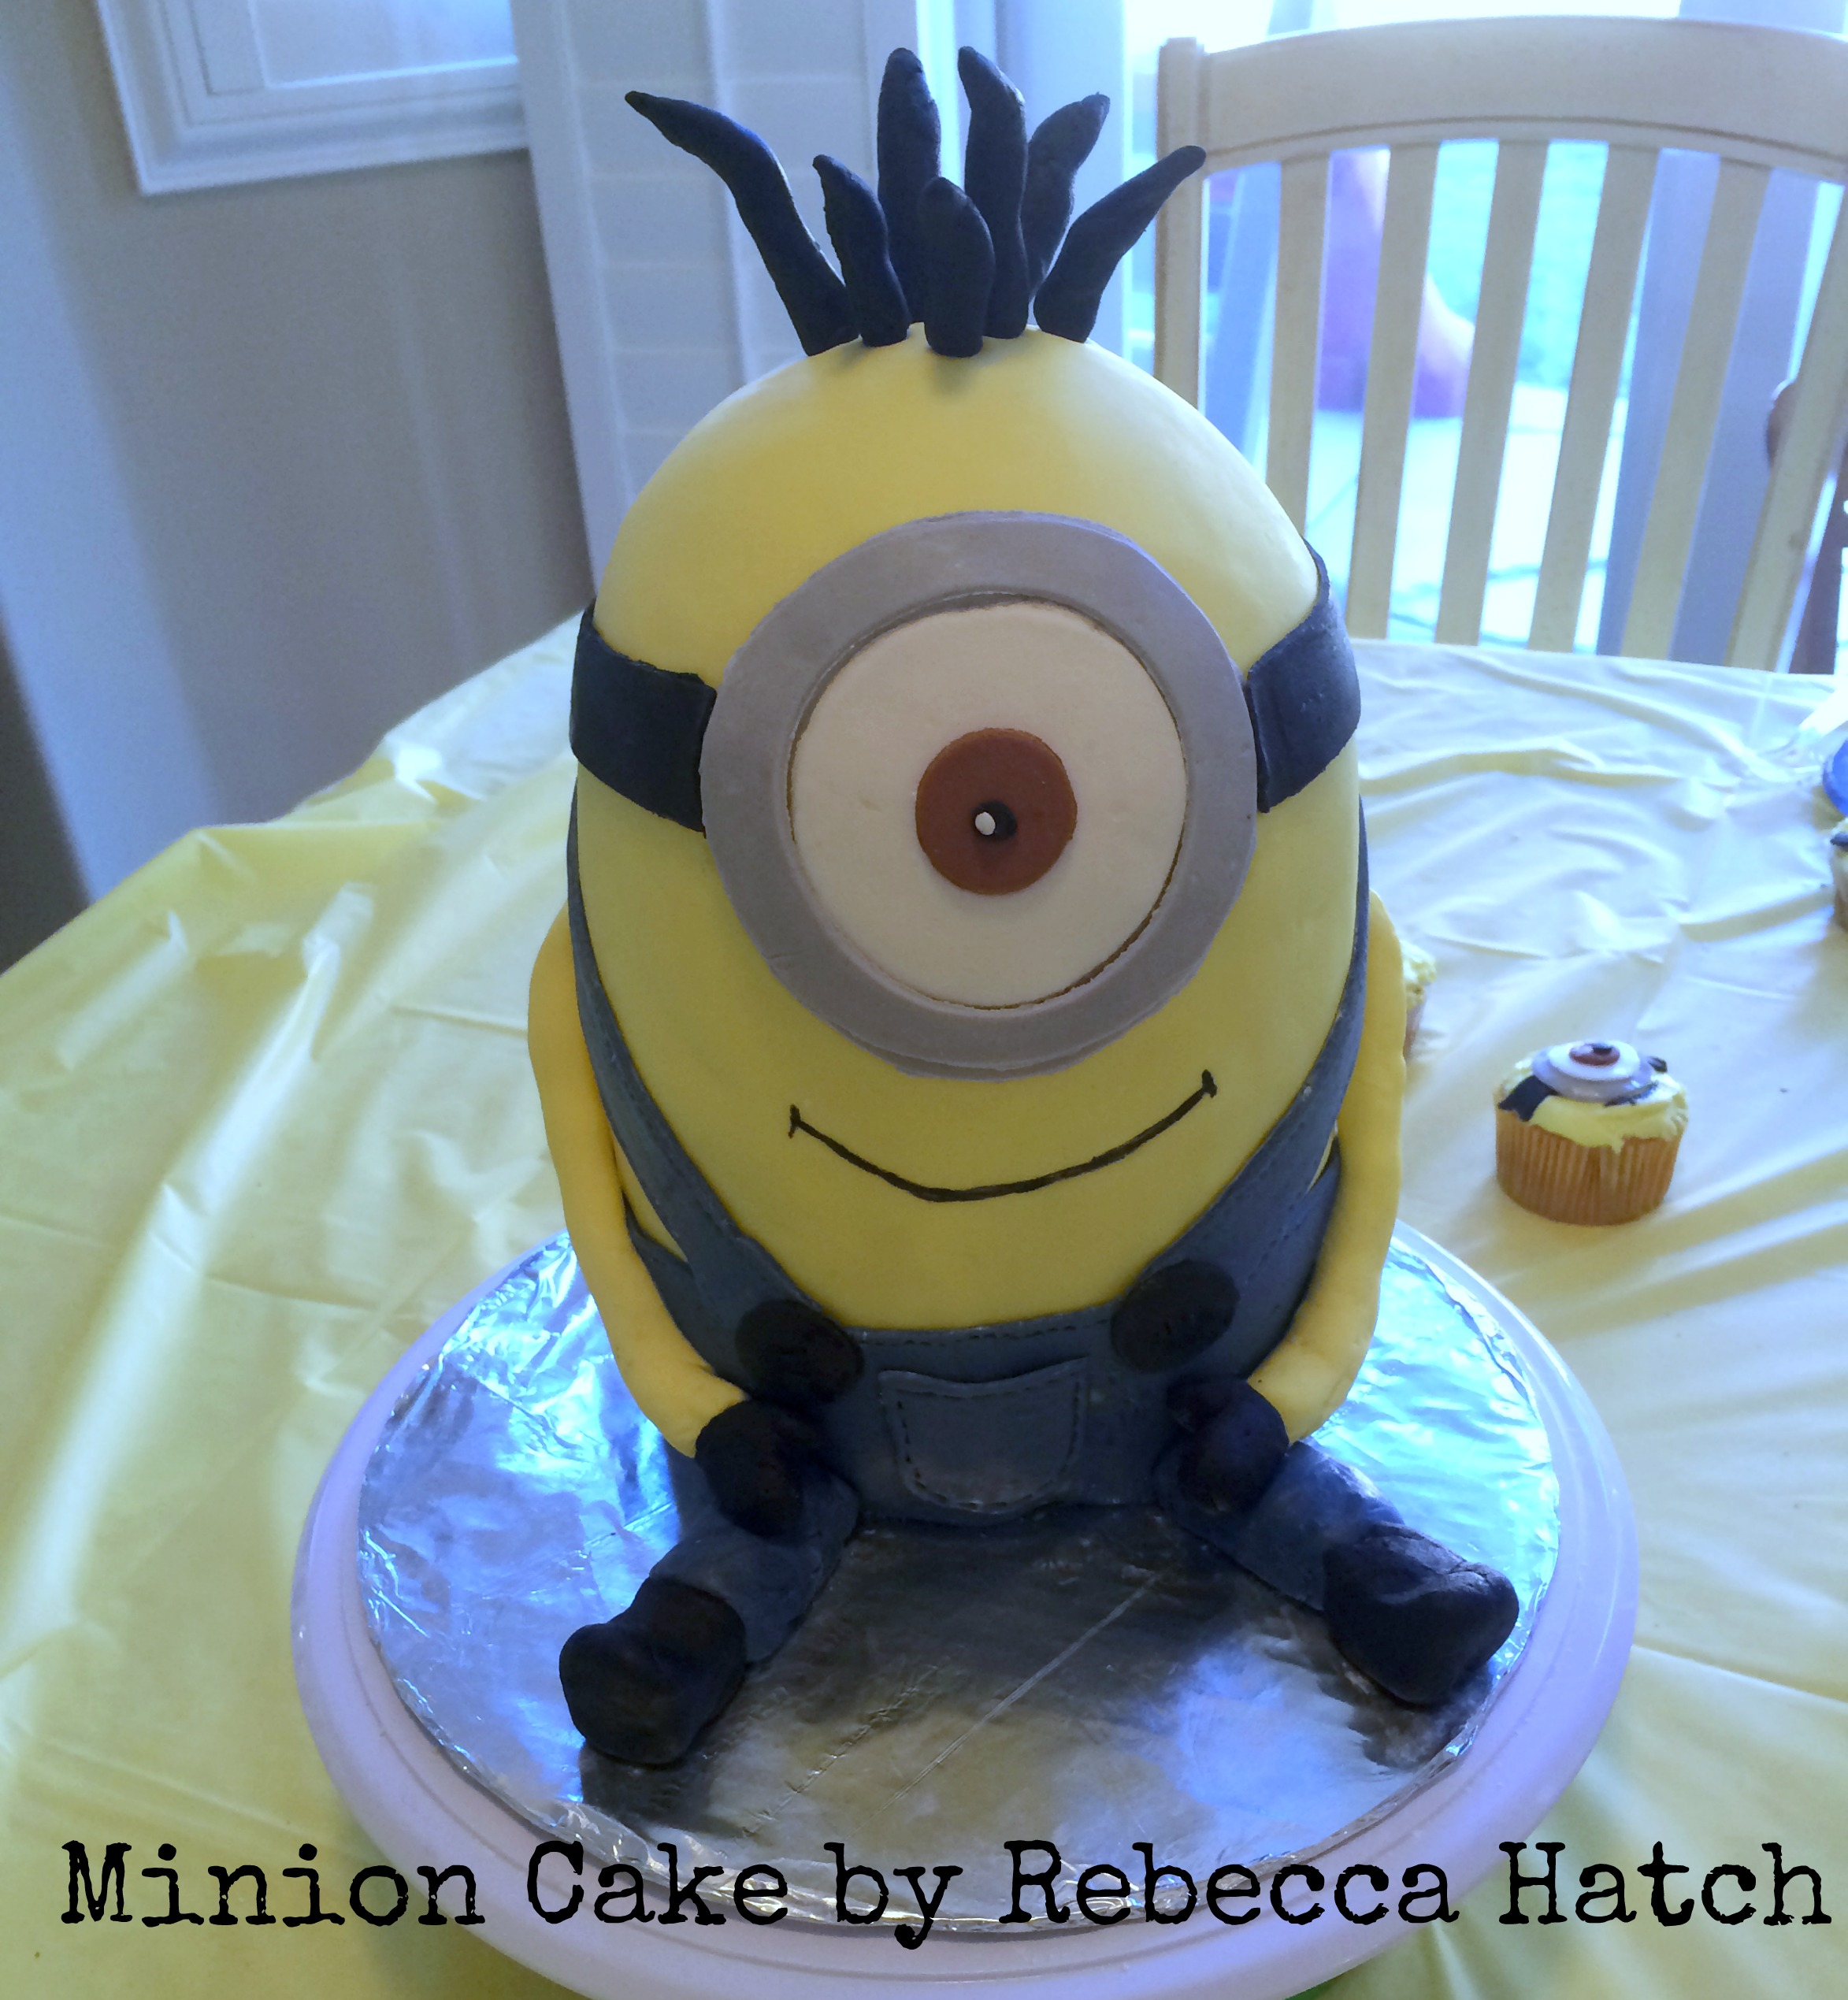 Minion birthday cake pans - minion cake pans | eBay  Top